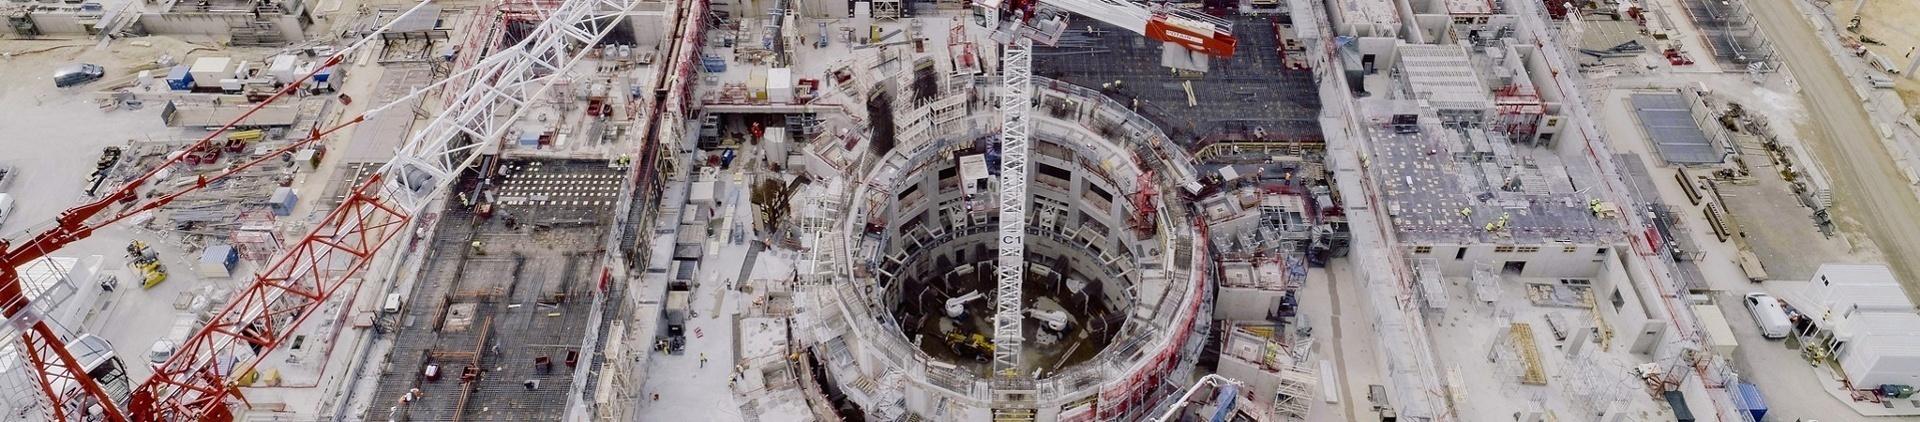 Replicating the sun's fusion energy